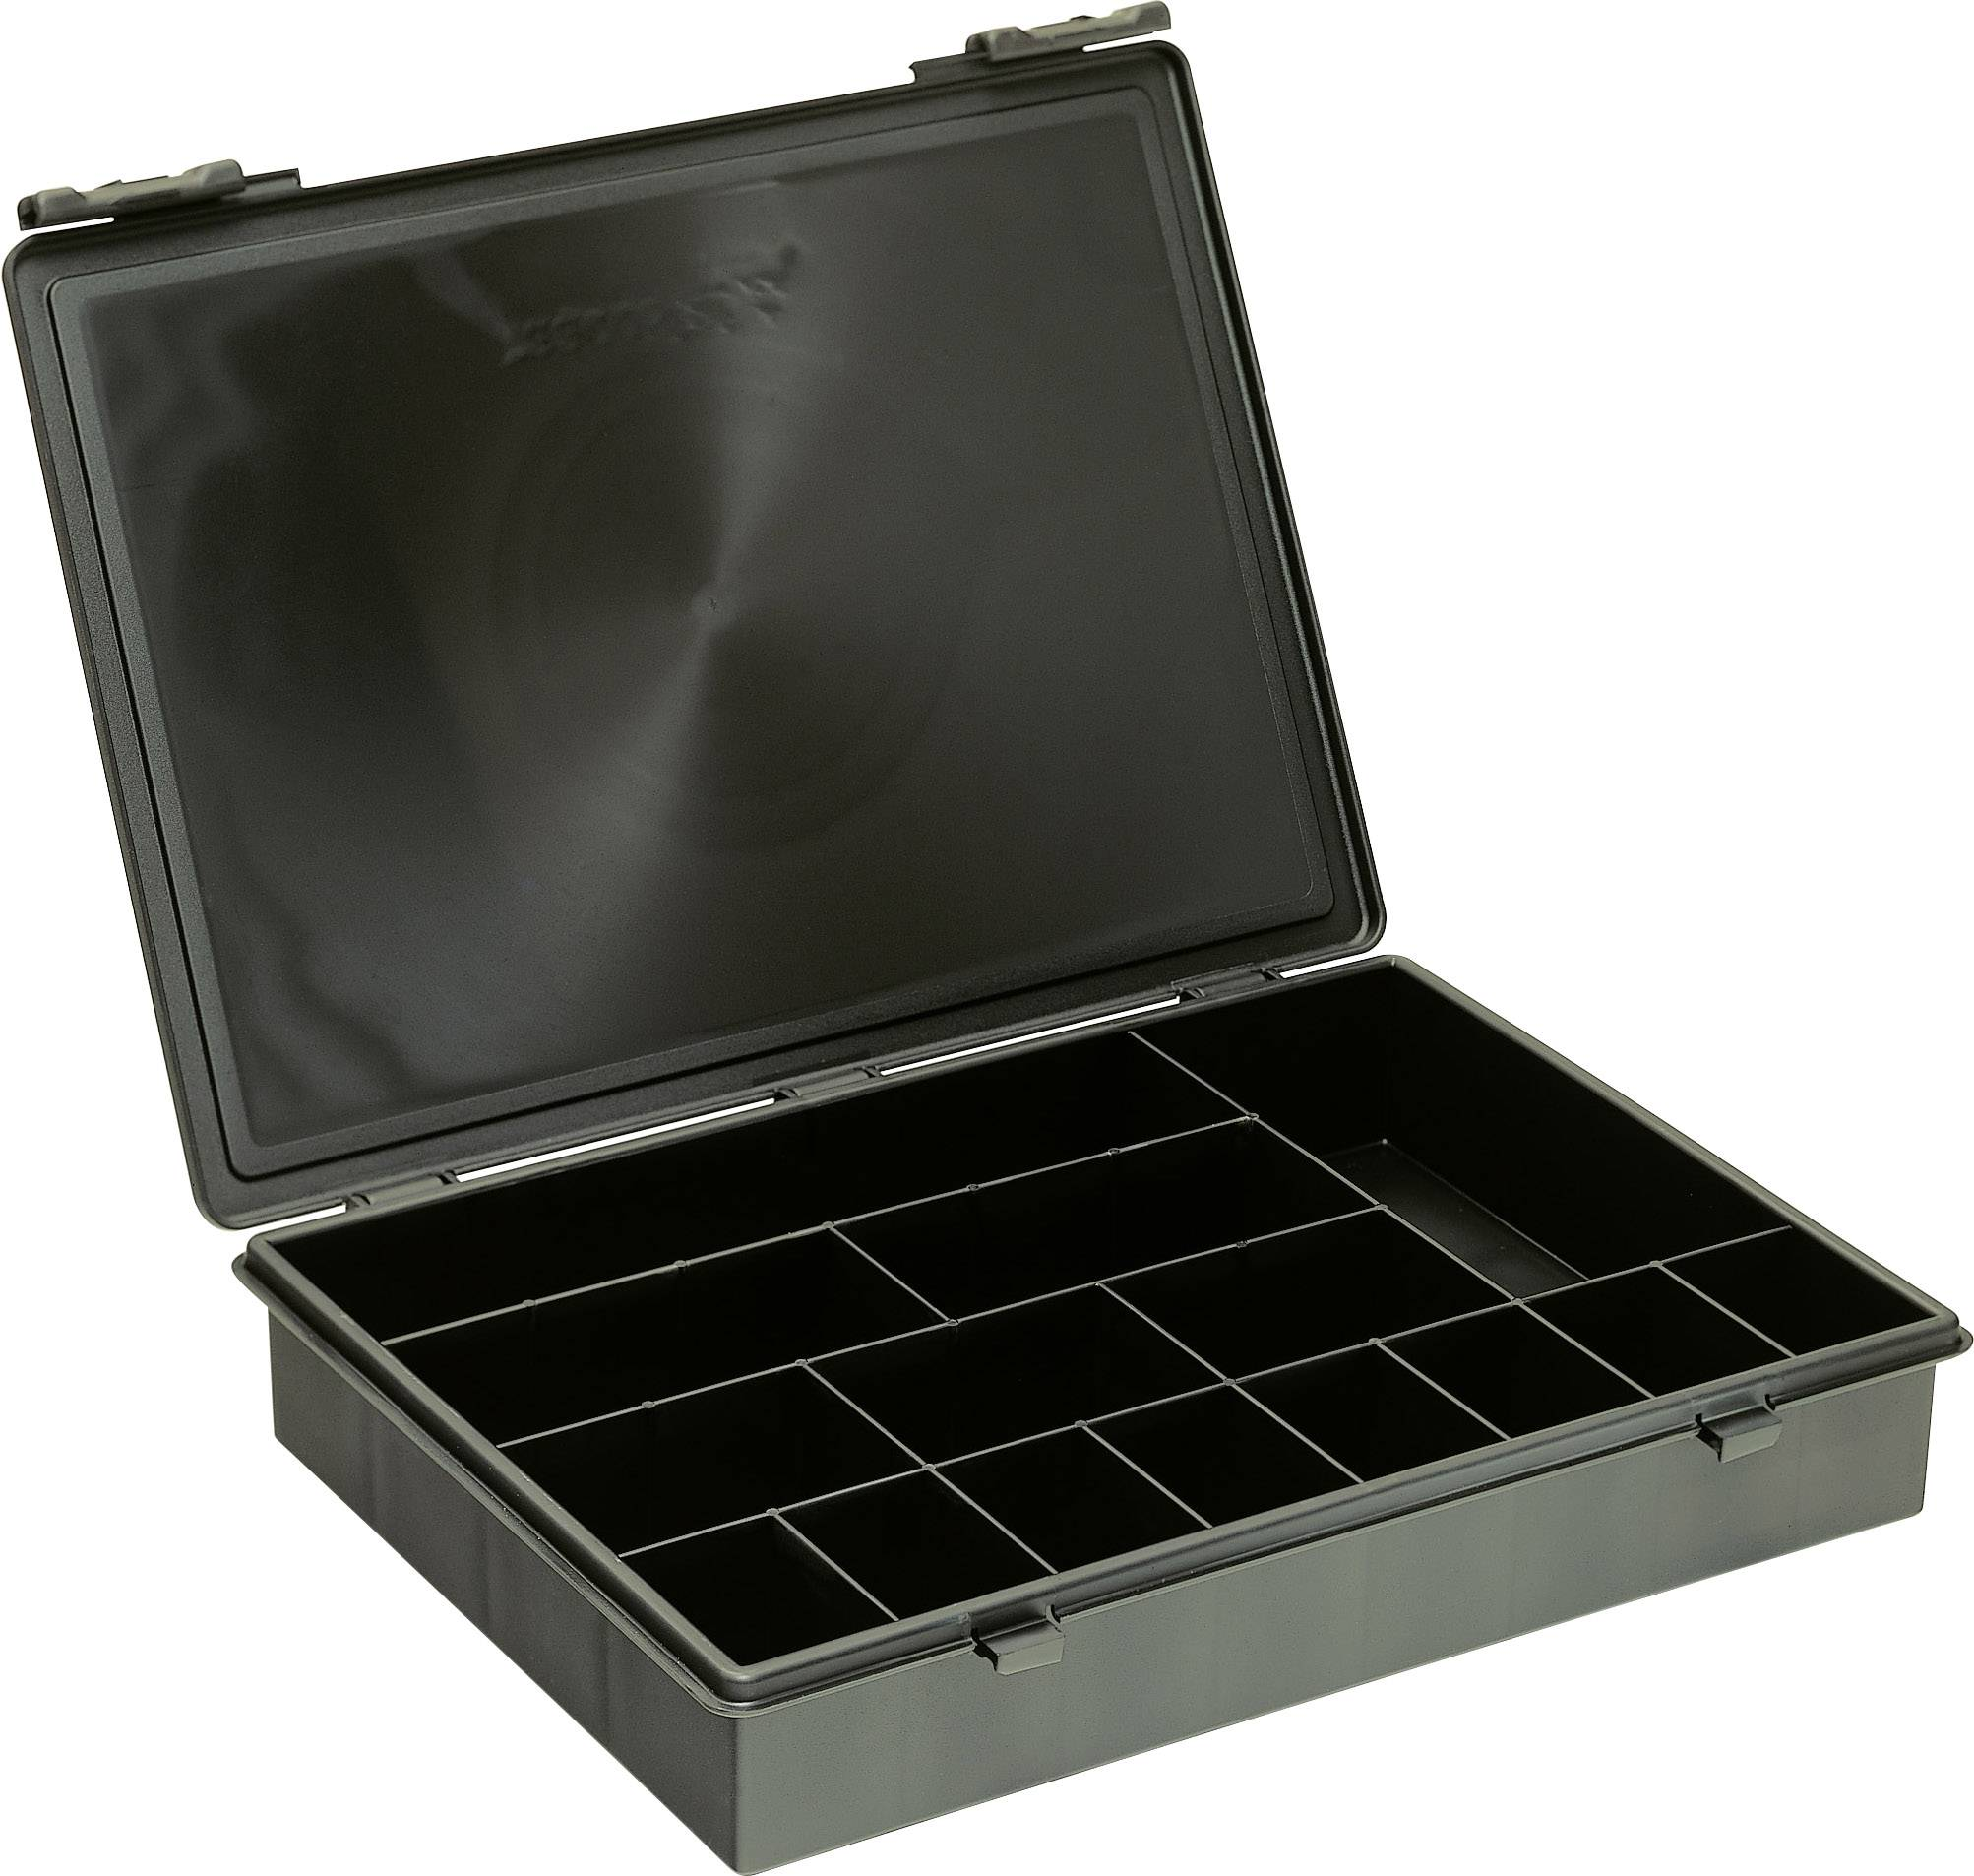 raaco ESD Assorter 4-15 esd-sortirna škatla (D x Š x V) 338 x 260 x 57 mm Število predalov: 15 trdna pregrada  1 kos